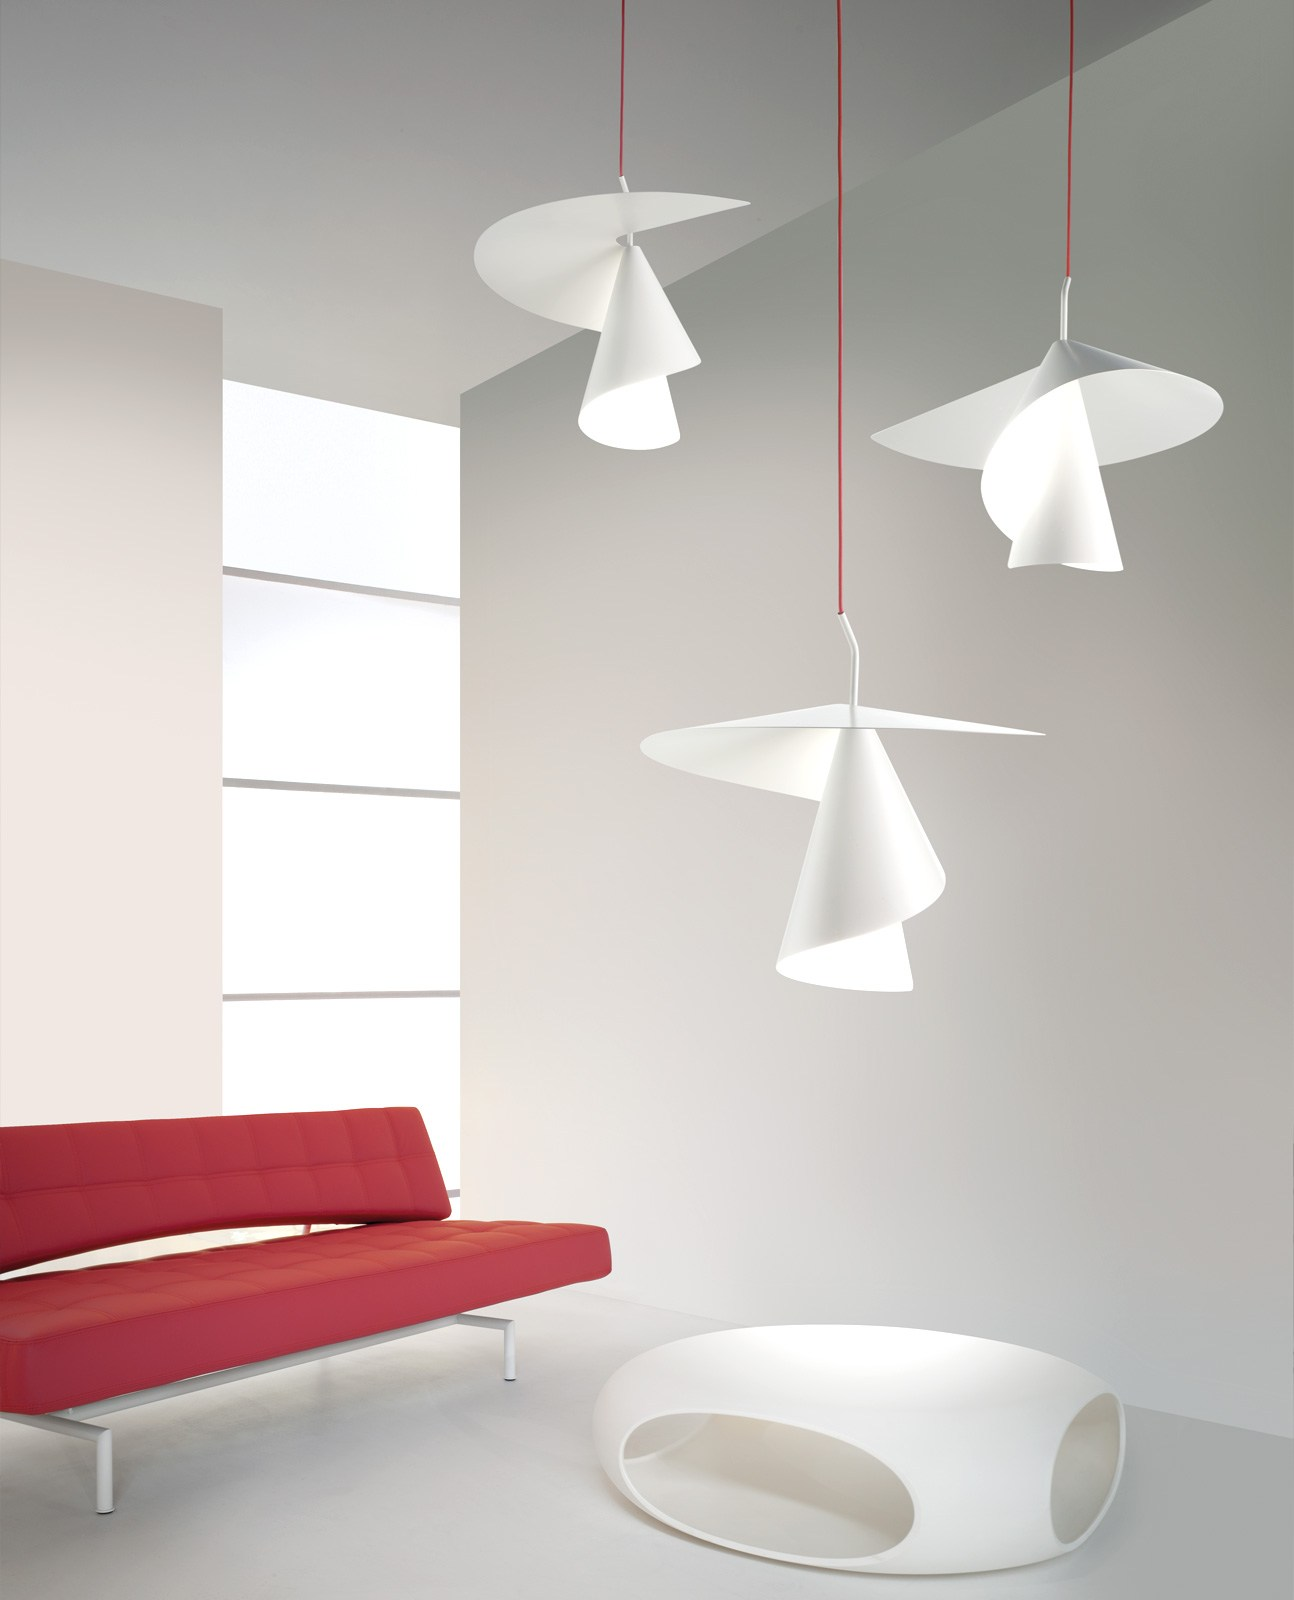 aluminium pendant lamp spiry by axo light design giovanni barbato. Black Bedroom Furniture Sets. Home Design Ideas